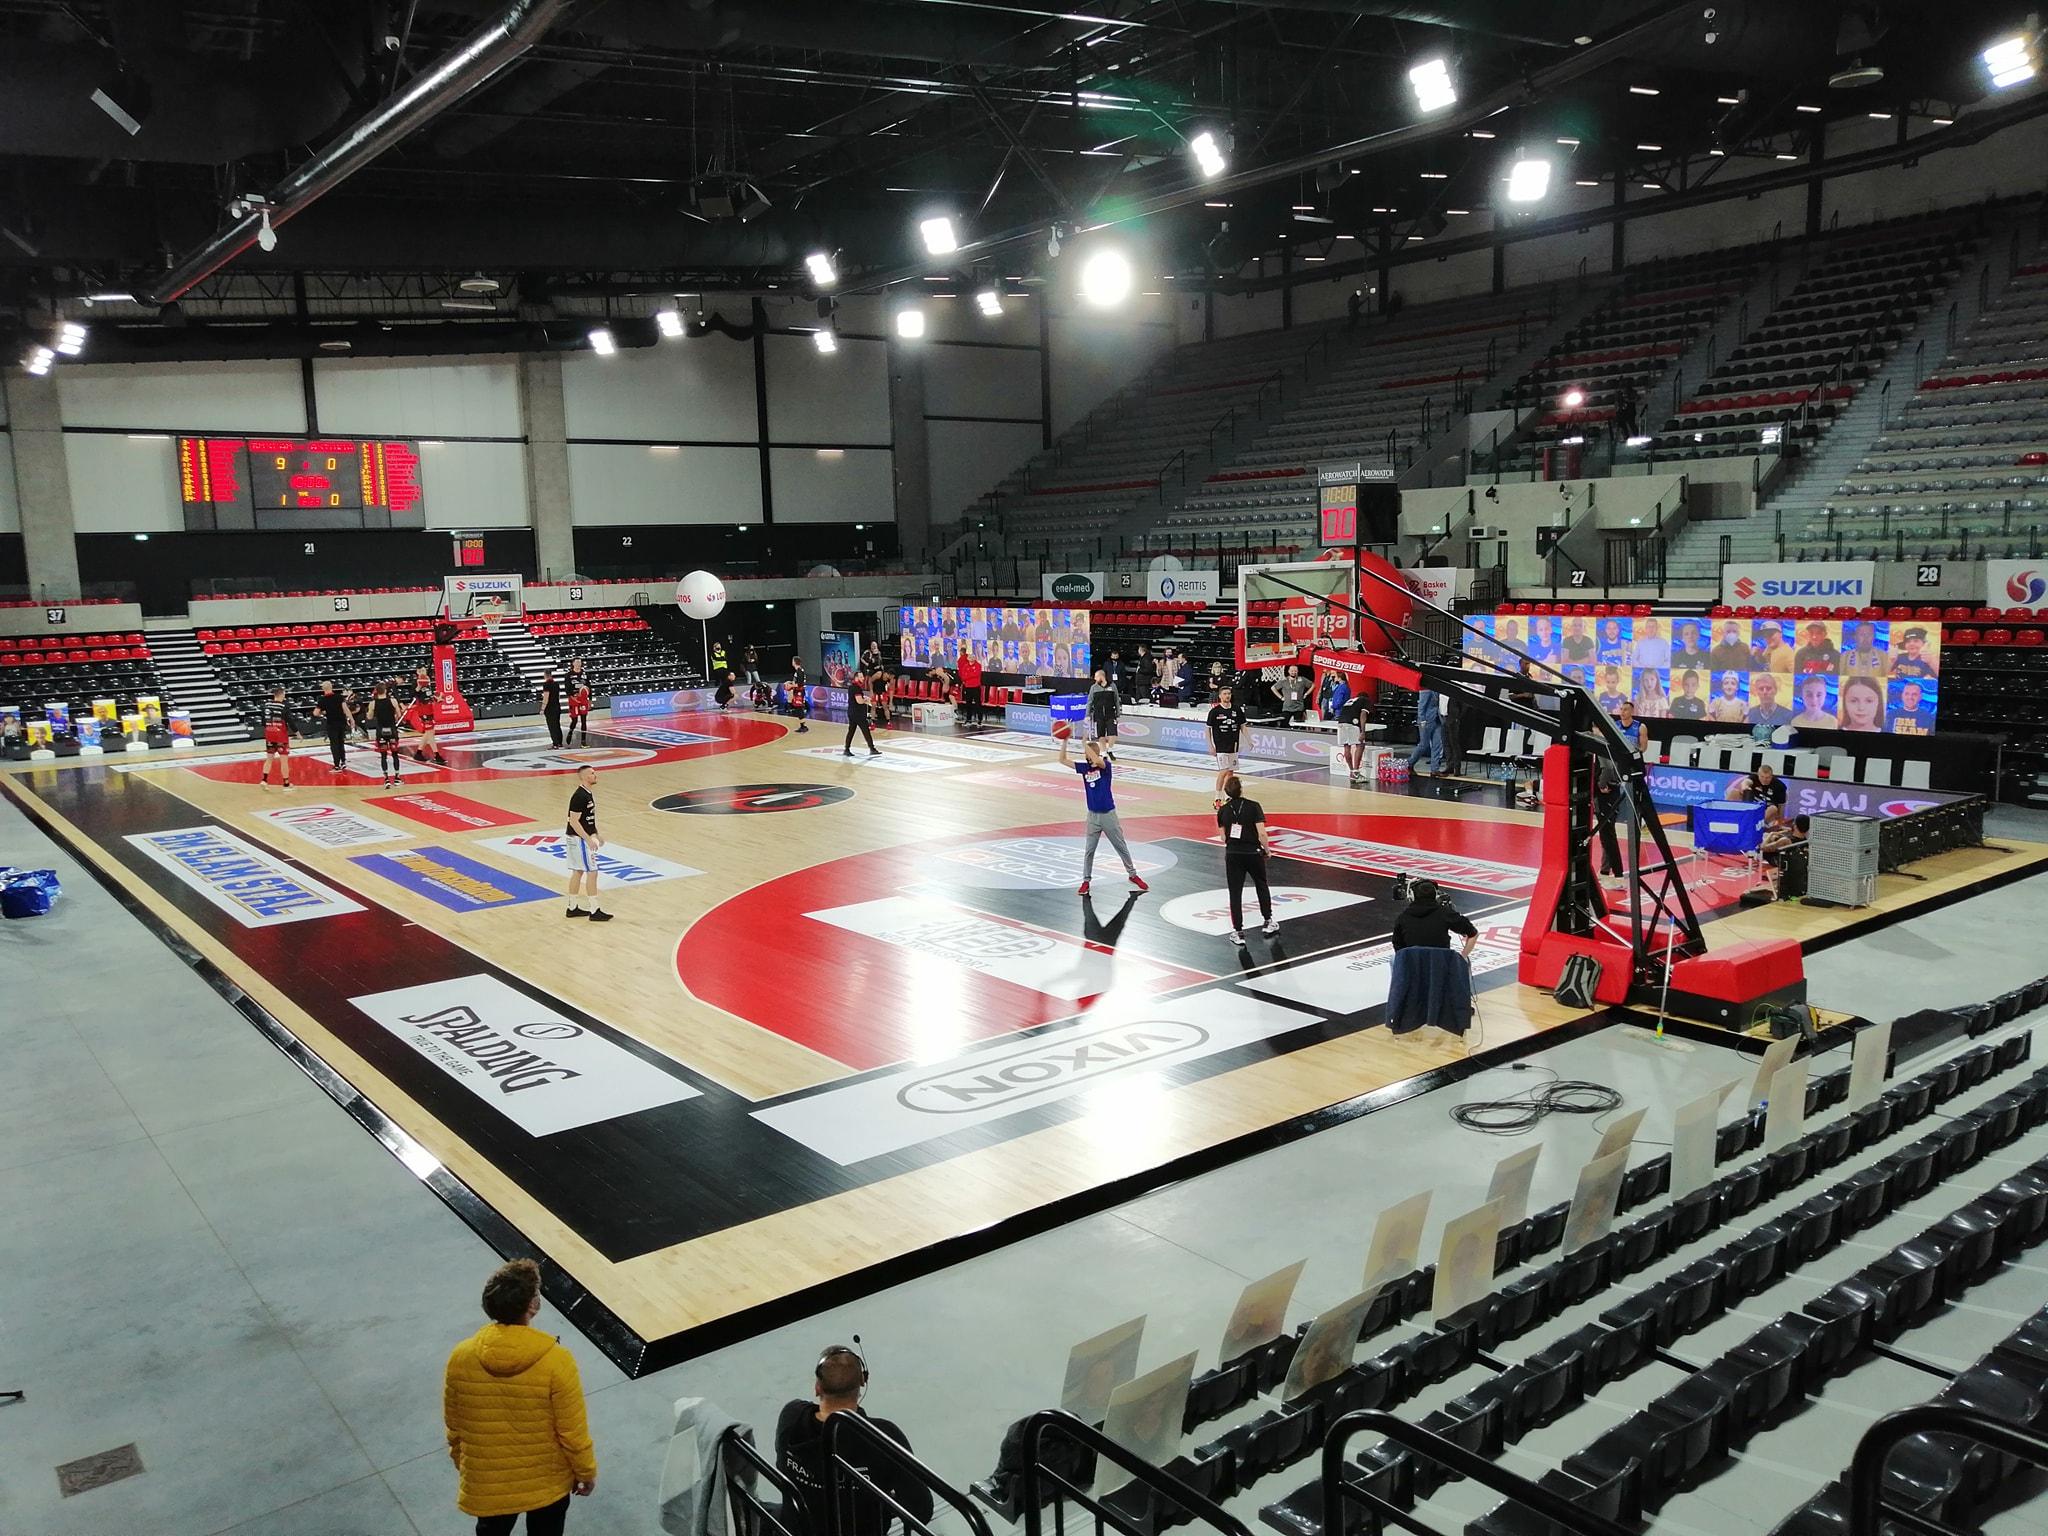 Arena Ostrów - ArenaOstrow facebook.com